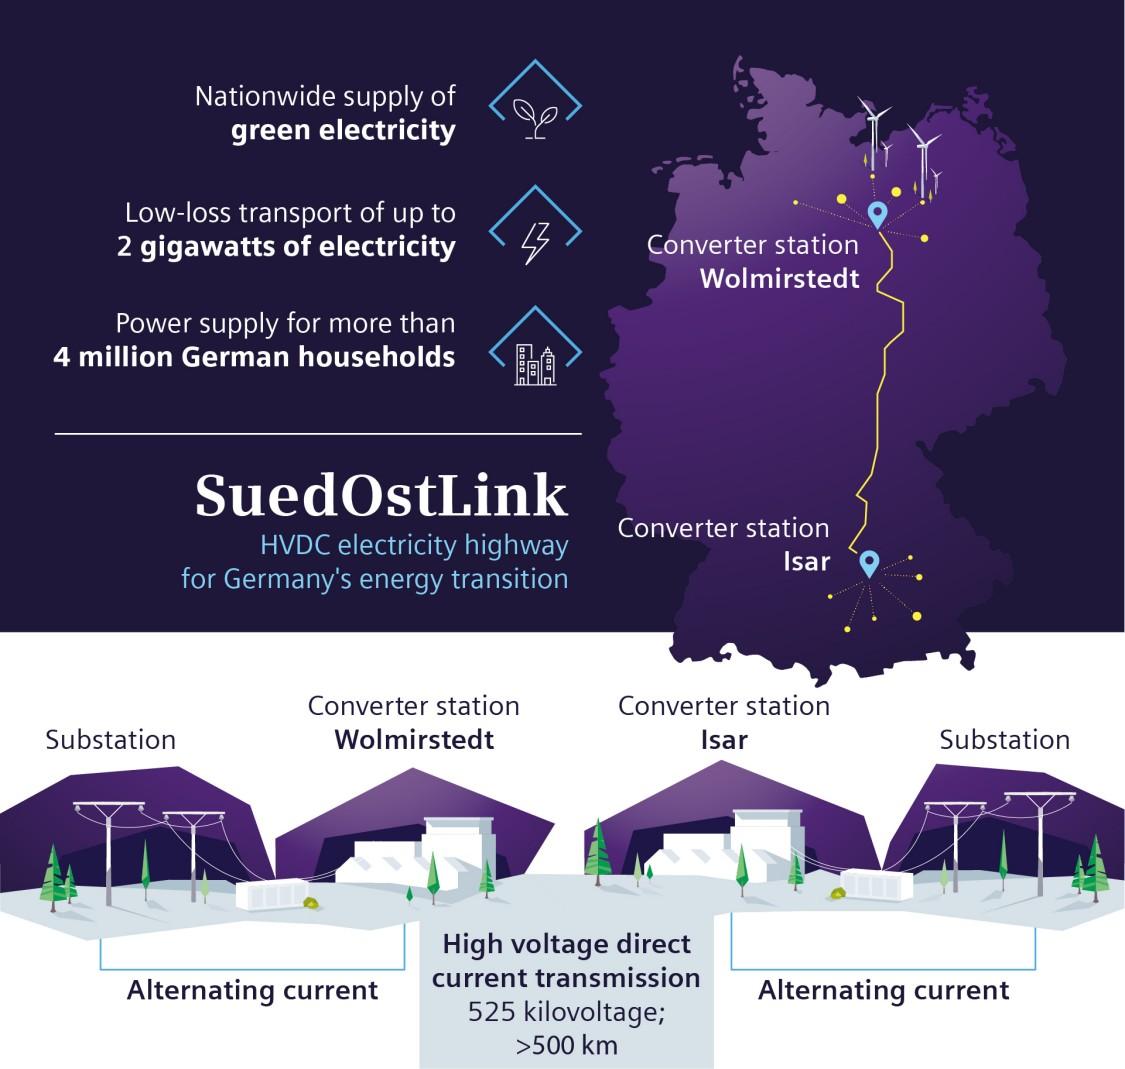 SuedOstLink Energy Highway